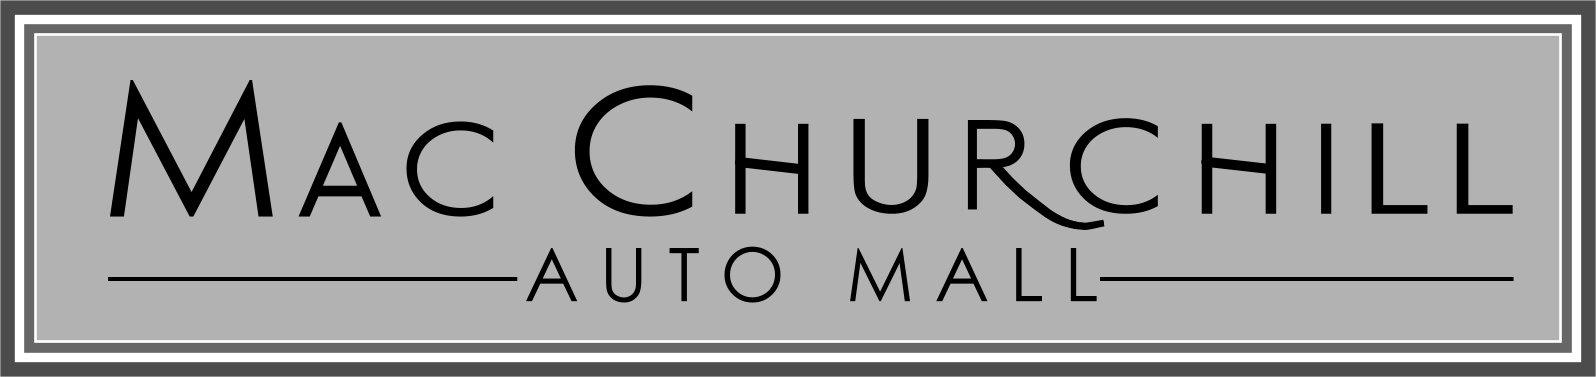 Mac Churchill Auto Mall